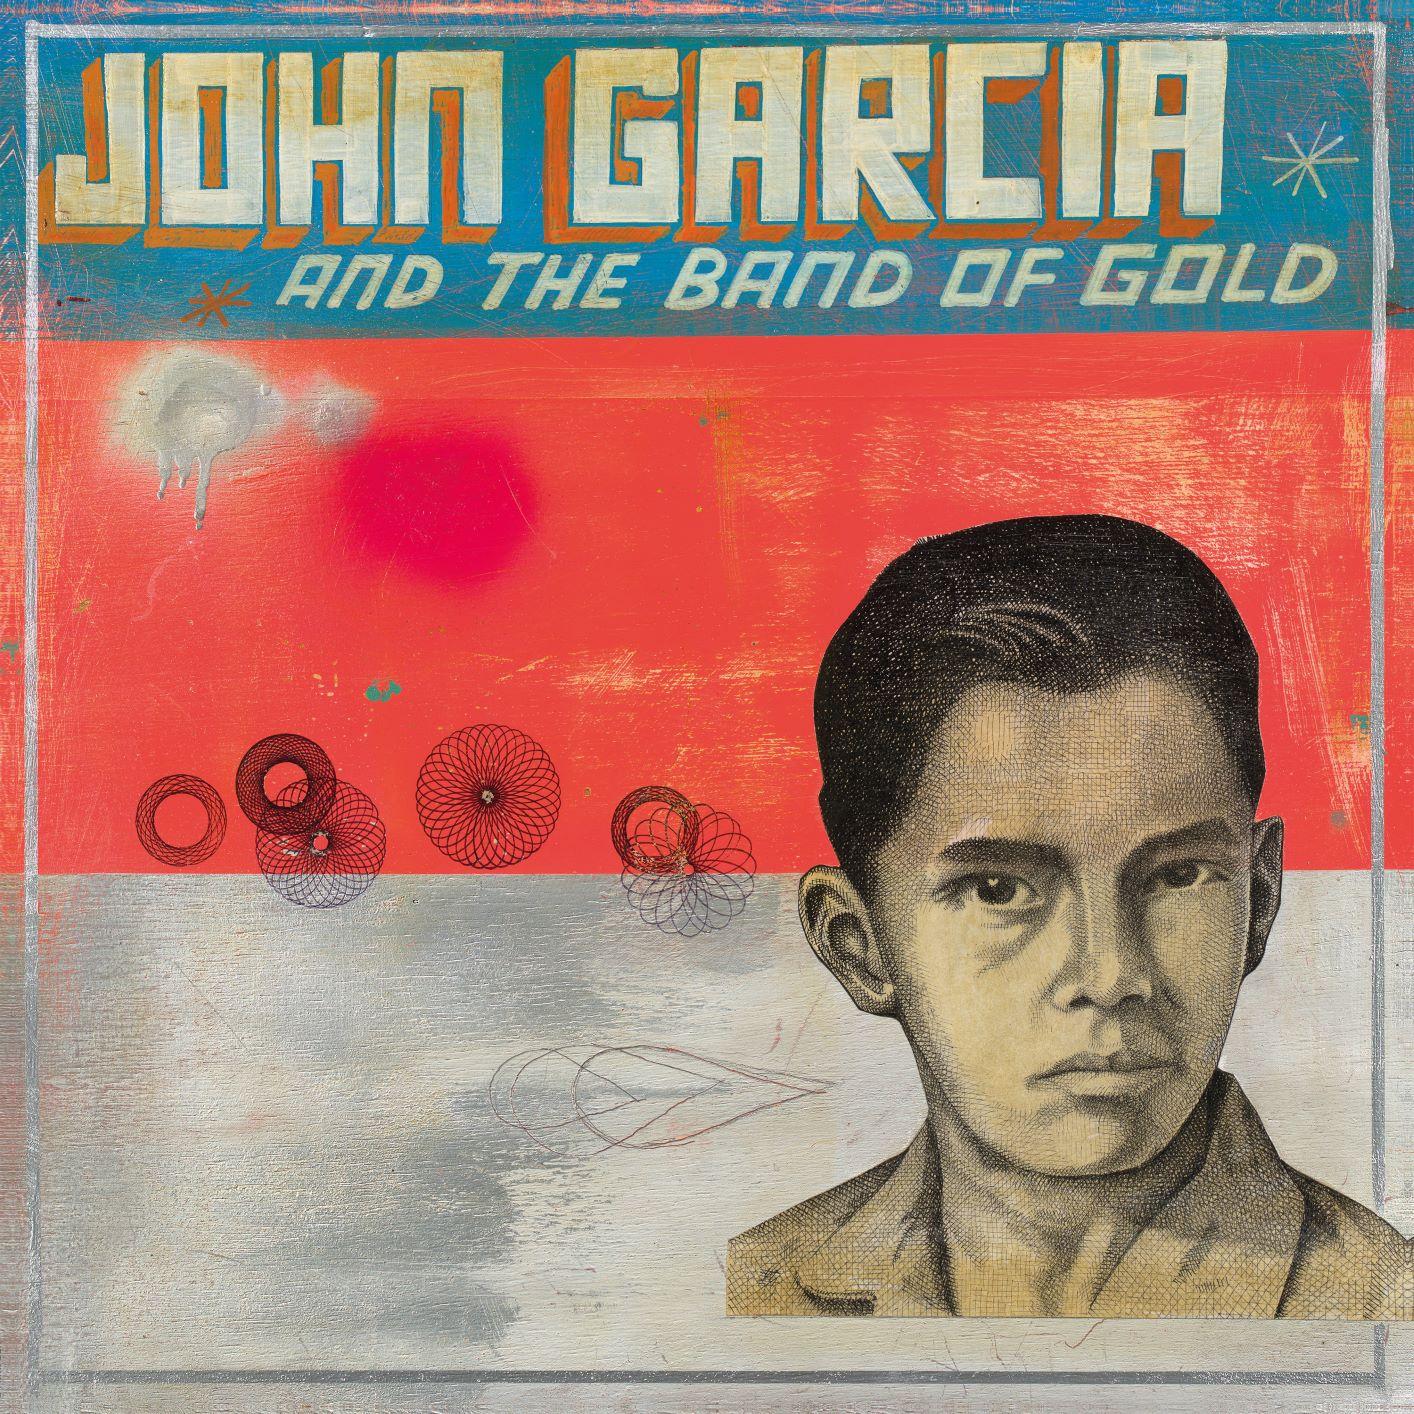 JohnGarcia_Albumcover